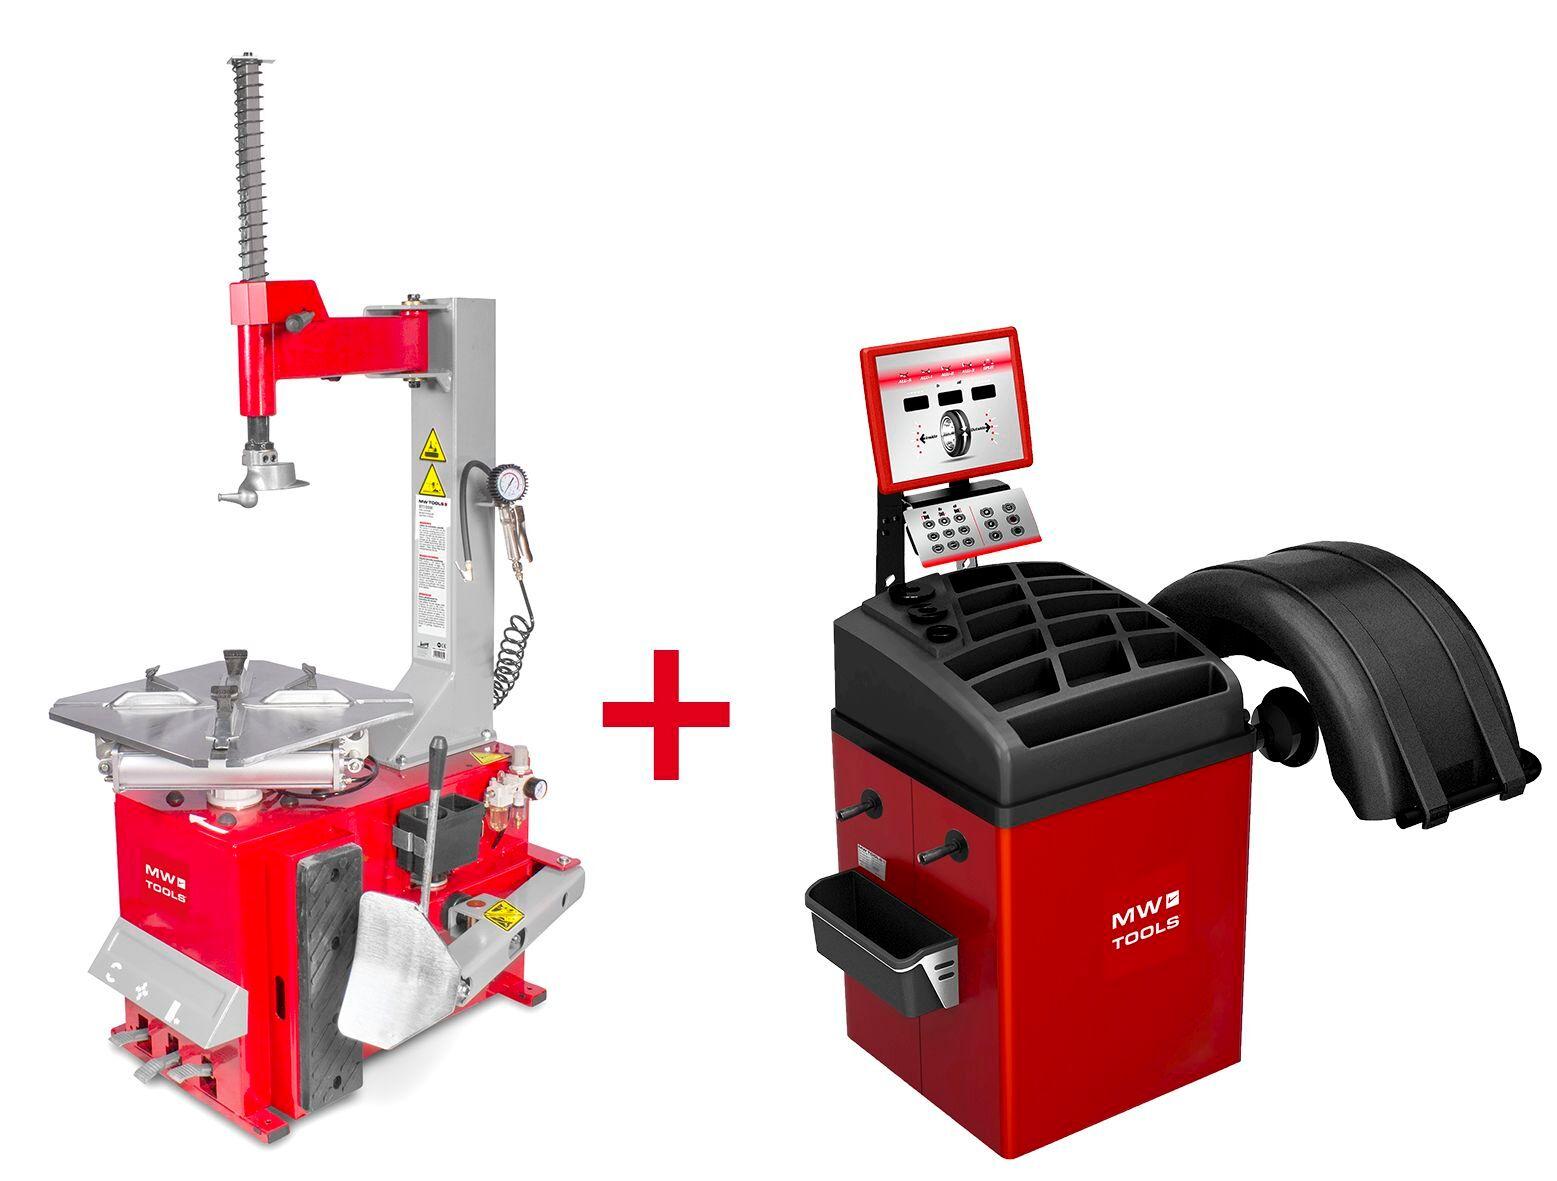 Mw-tools Pack démonte-pneu BT100 3x380V et équilibreuse de roues BB350 220V MW-Tools BT100 SET3